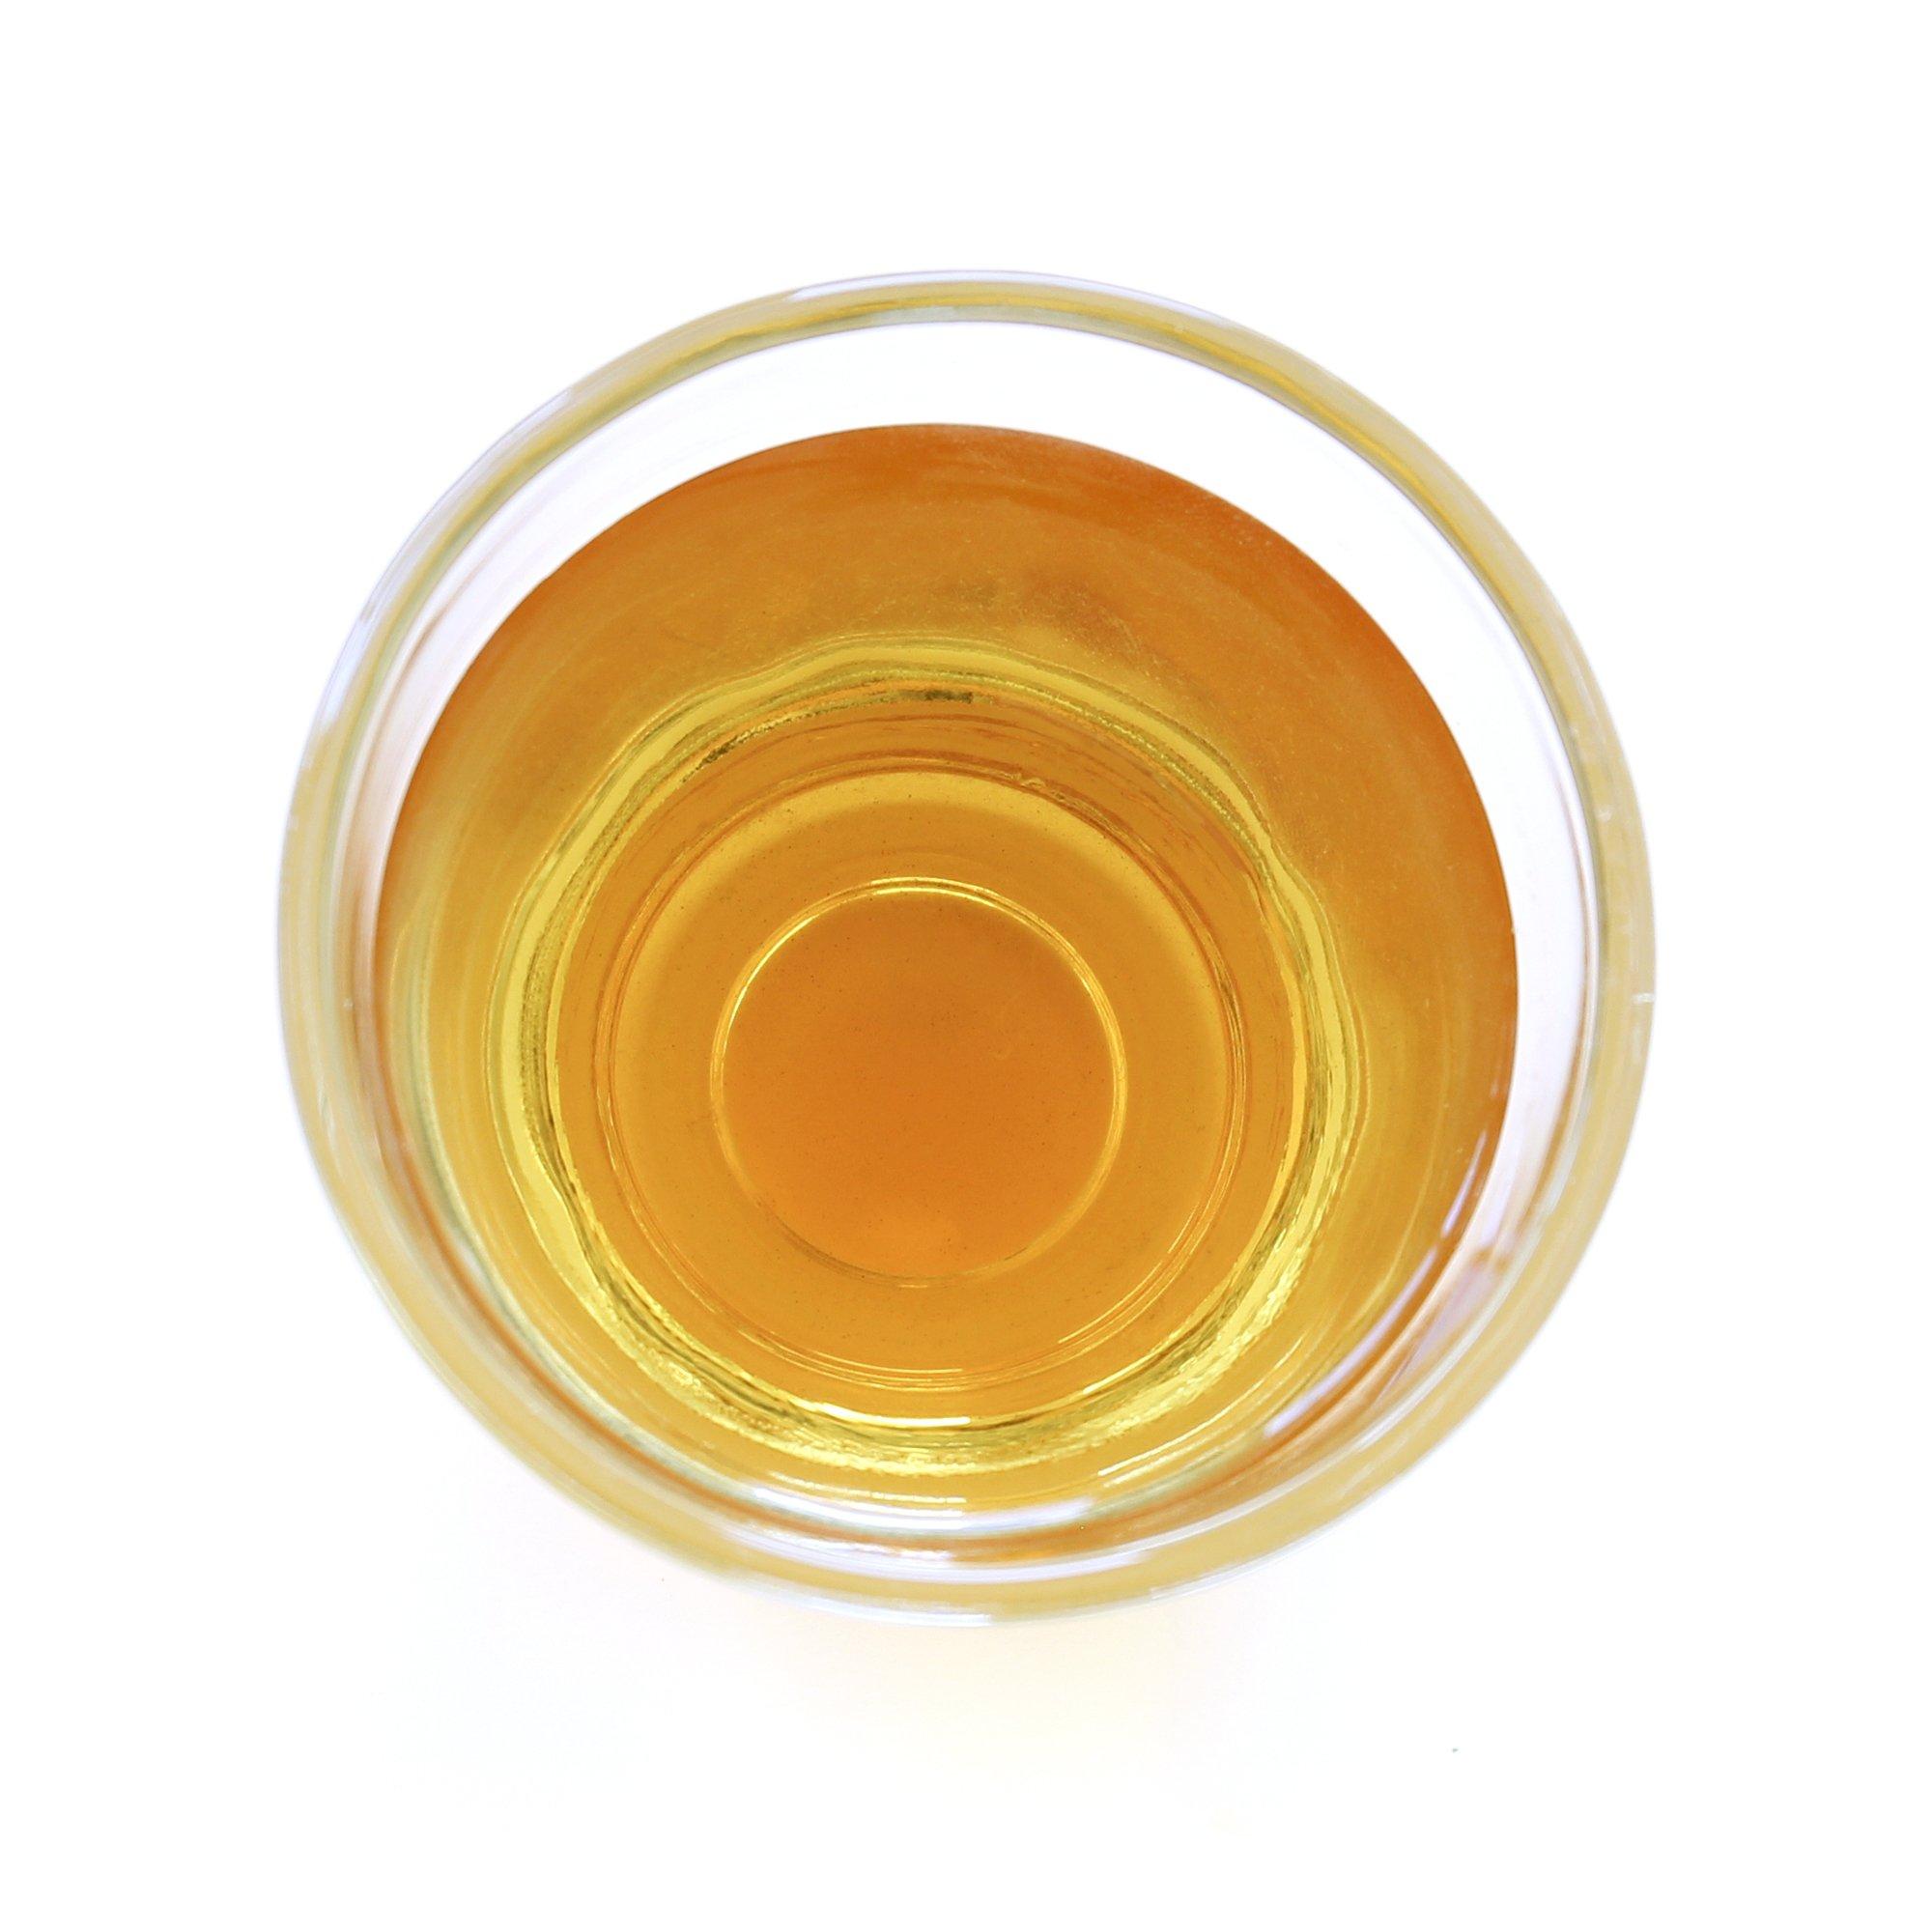 Natural Taiwan High Mountain Sapphire GABA Loose Leaf Oolong Tea, 50g/1.76 oz by TEAMALCHI (Image #5)